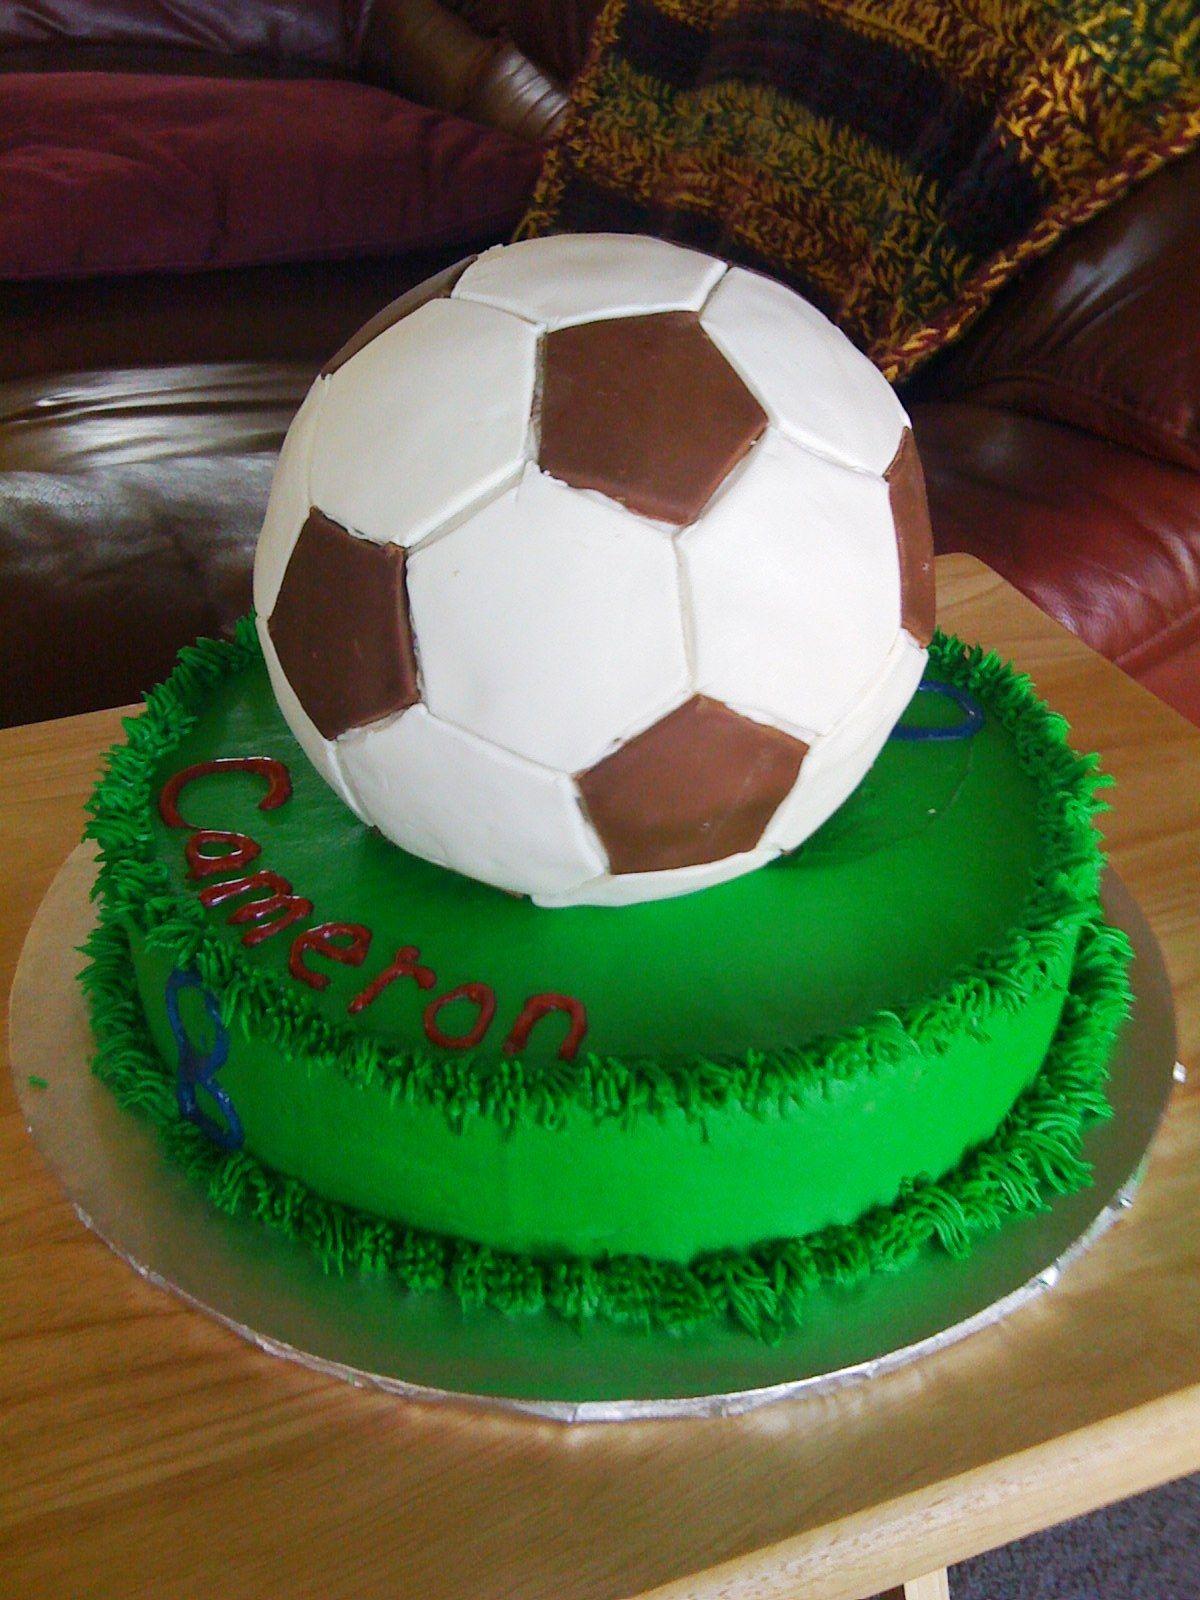 My Cakes Soccer Ball Wilton Ball Cake Pan 10 Pan Choco Pan Fondant Bright White And Dark Chocolate Using Hexago Decorator Icing Soccer Cake Icing Tips